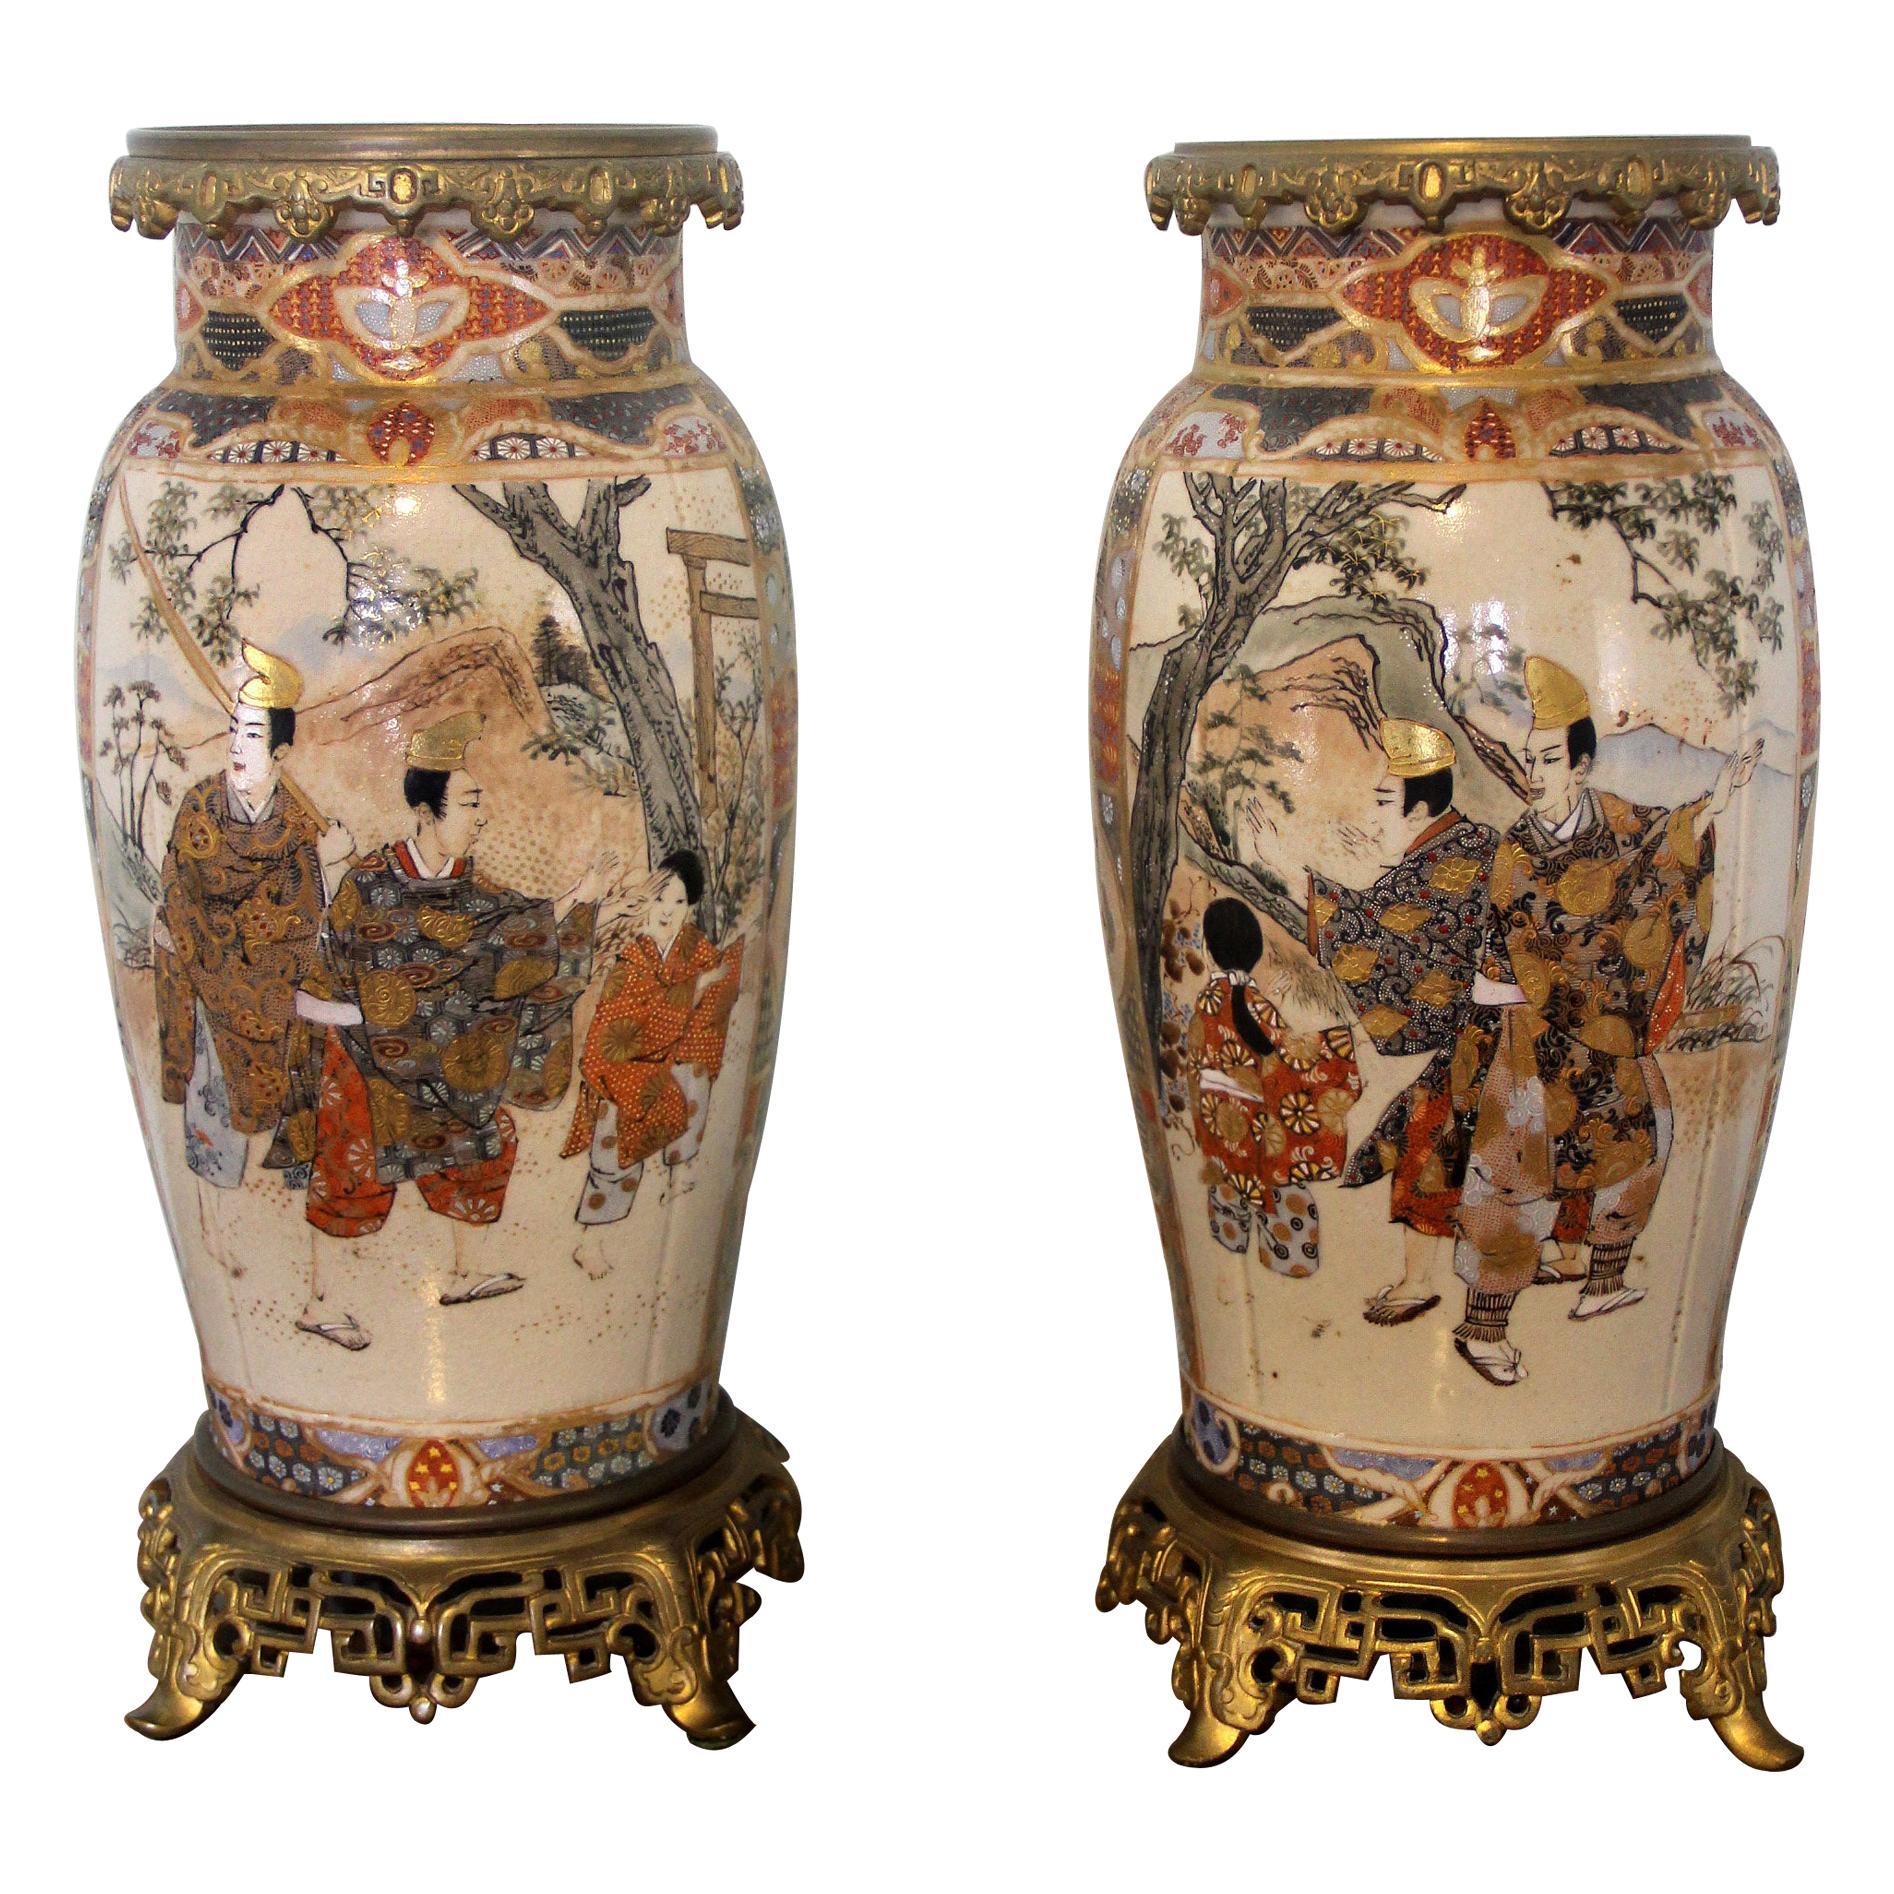 Fine Pair of Late 19th Century Gilt Bronze and Japanese Satsuma Porcelain Vases